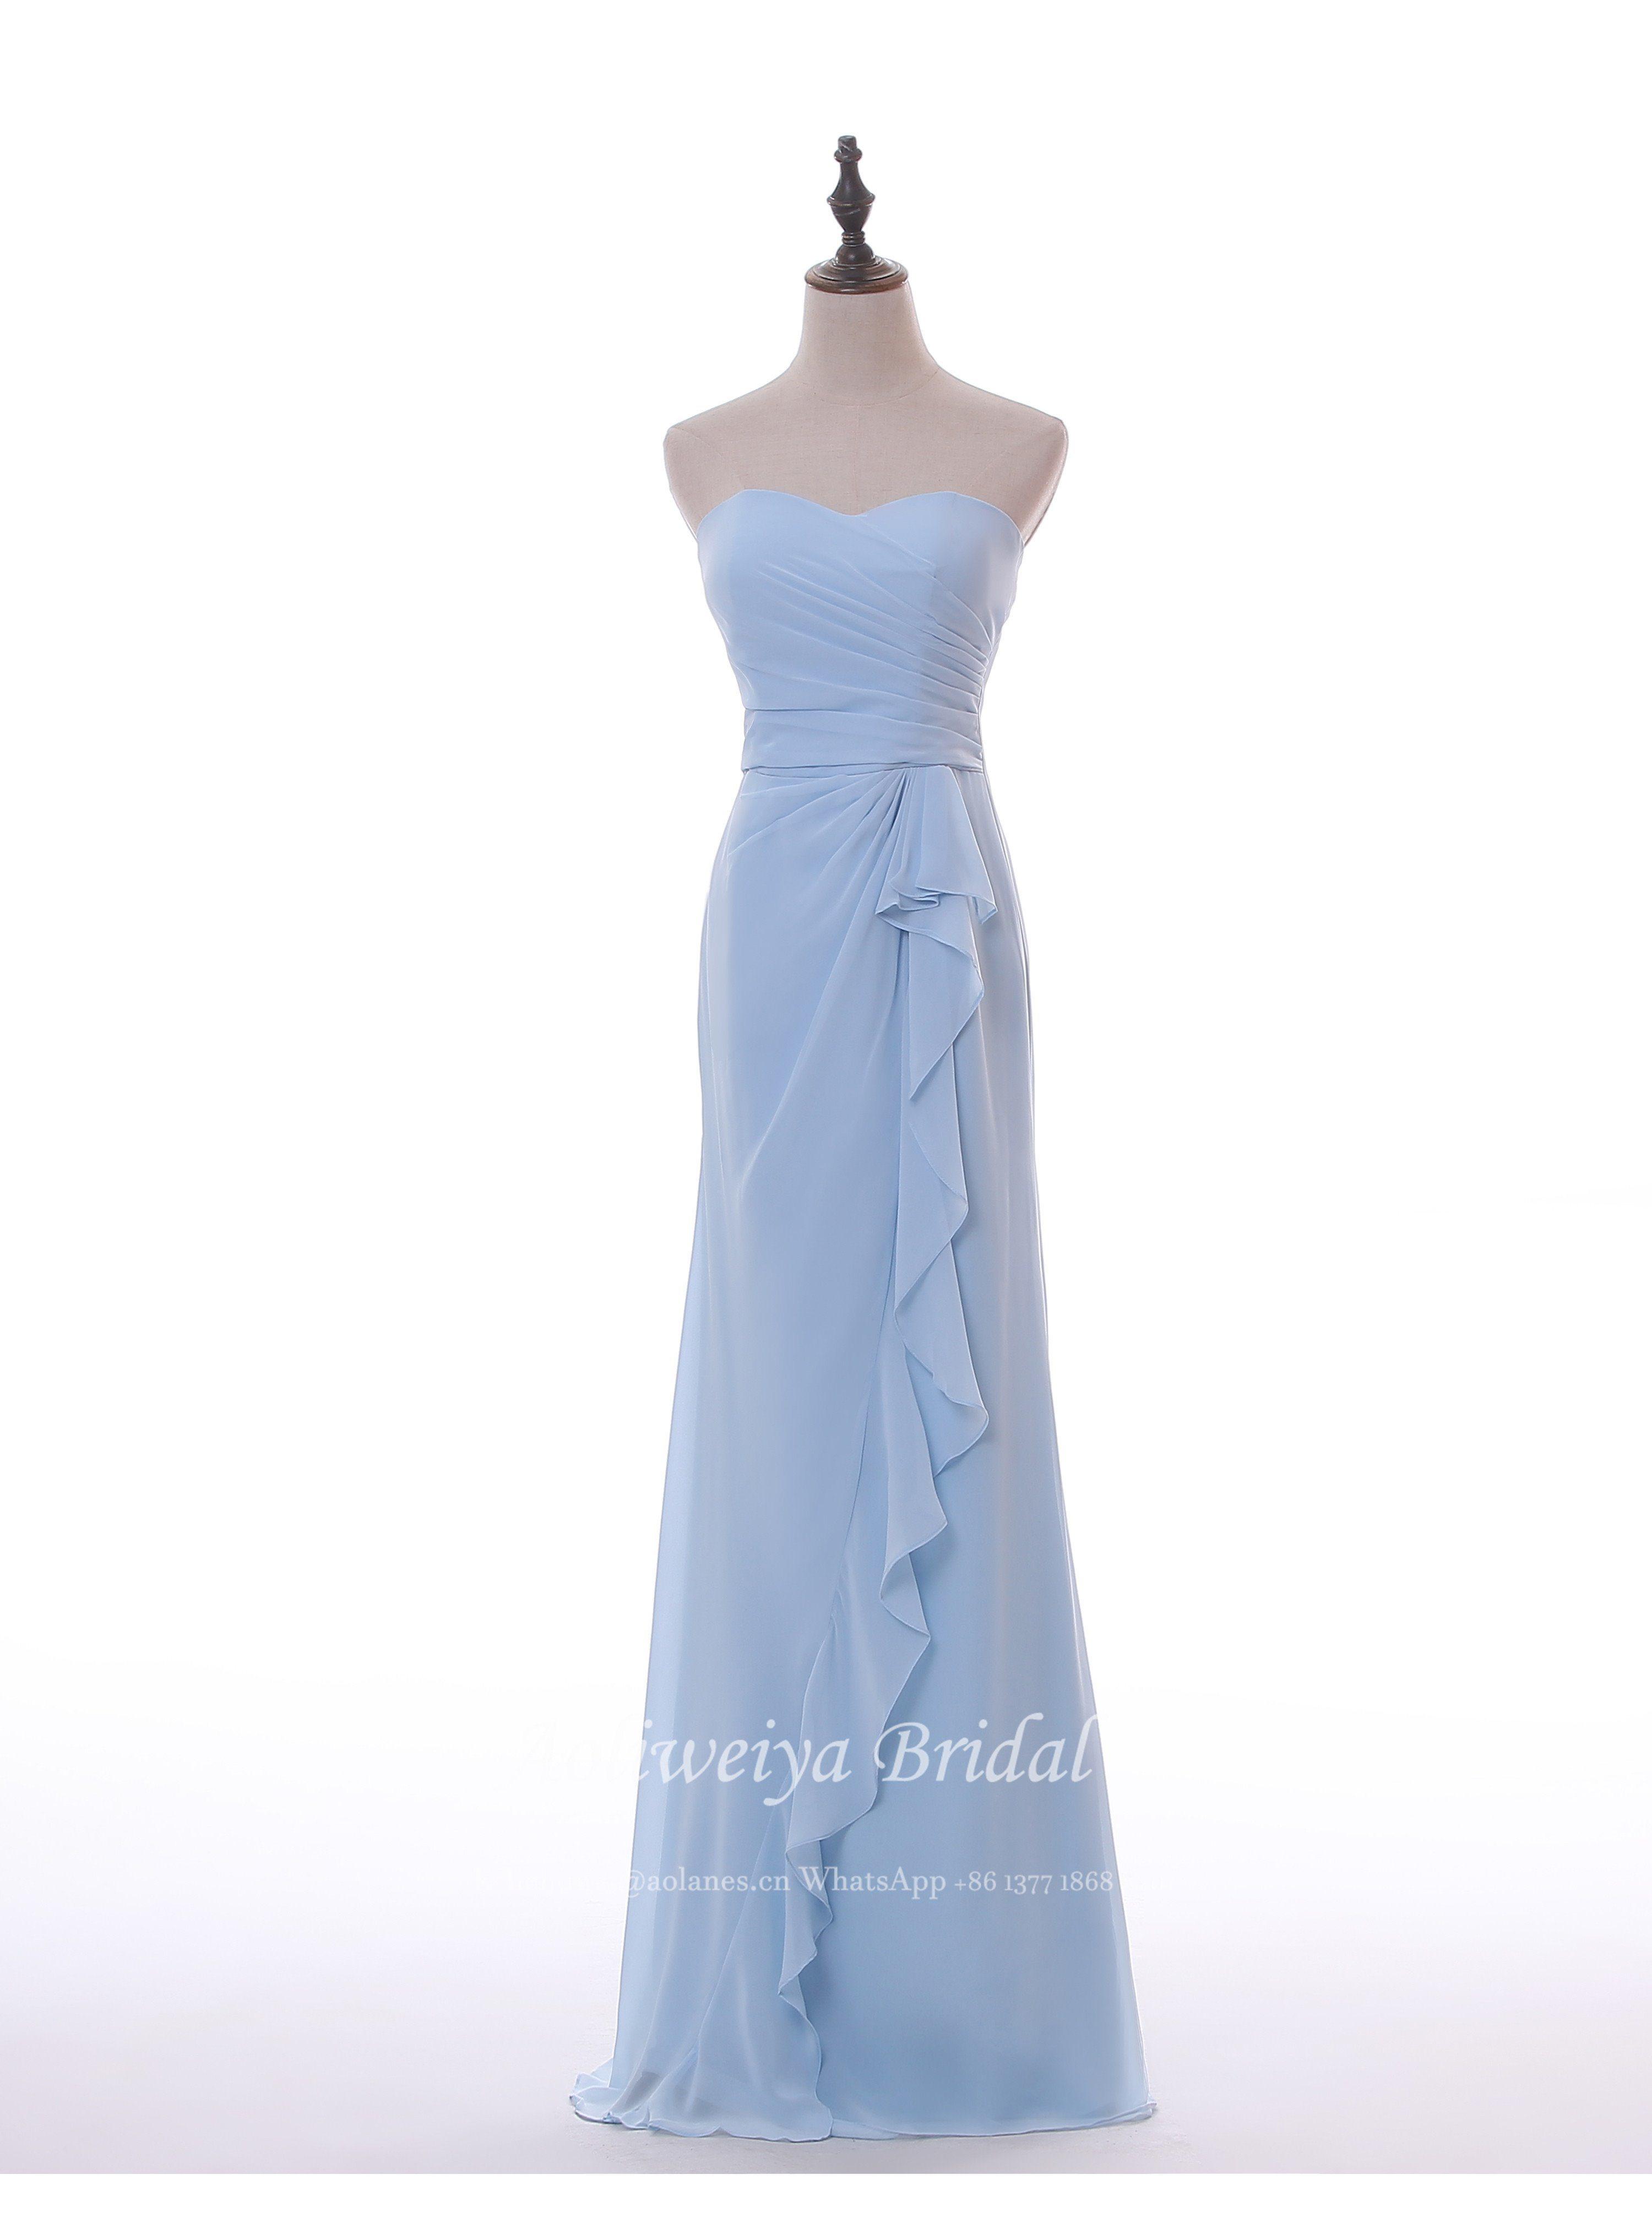 China Aolanes Fours Colors Wedding Bridesmaid Dresses - China ...